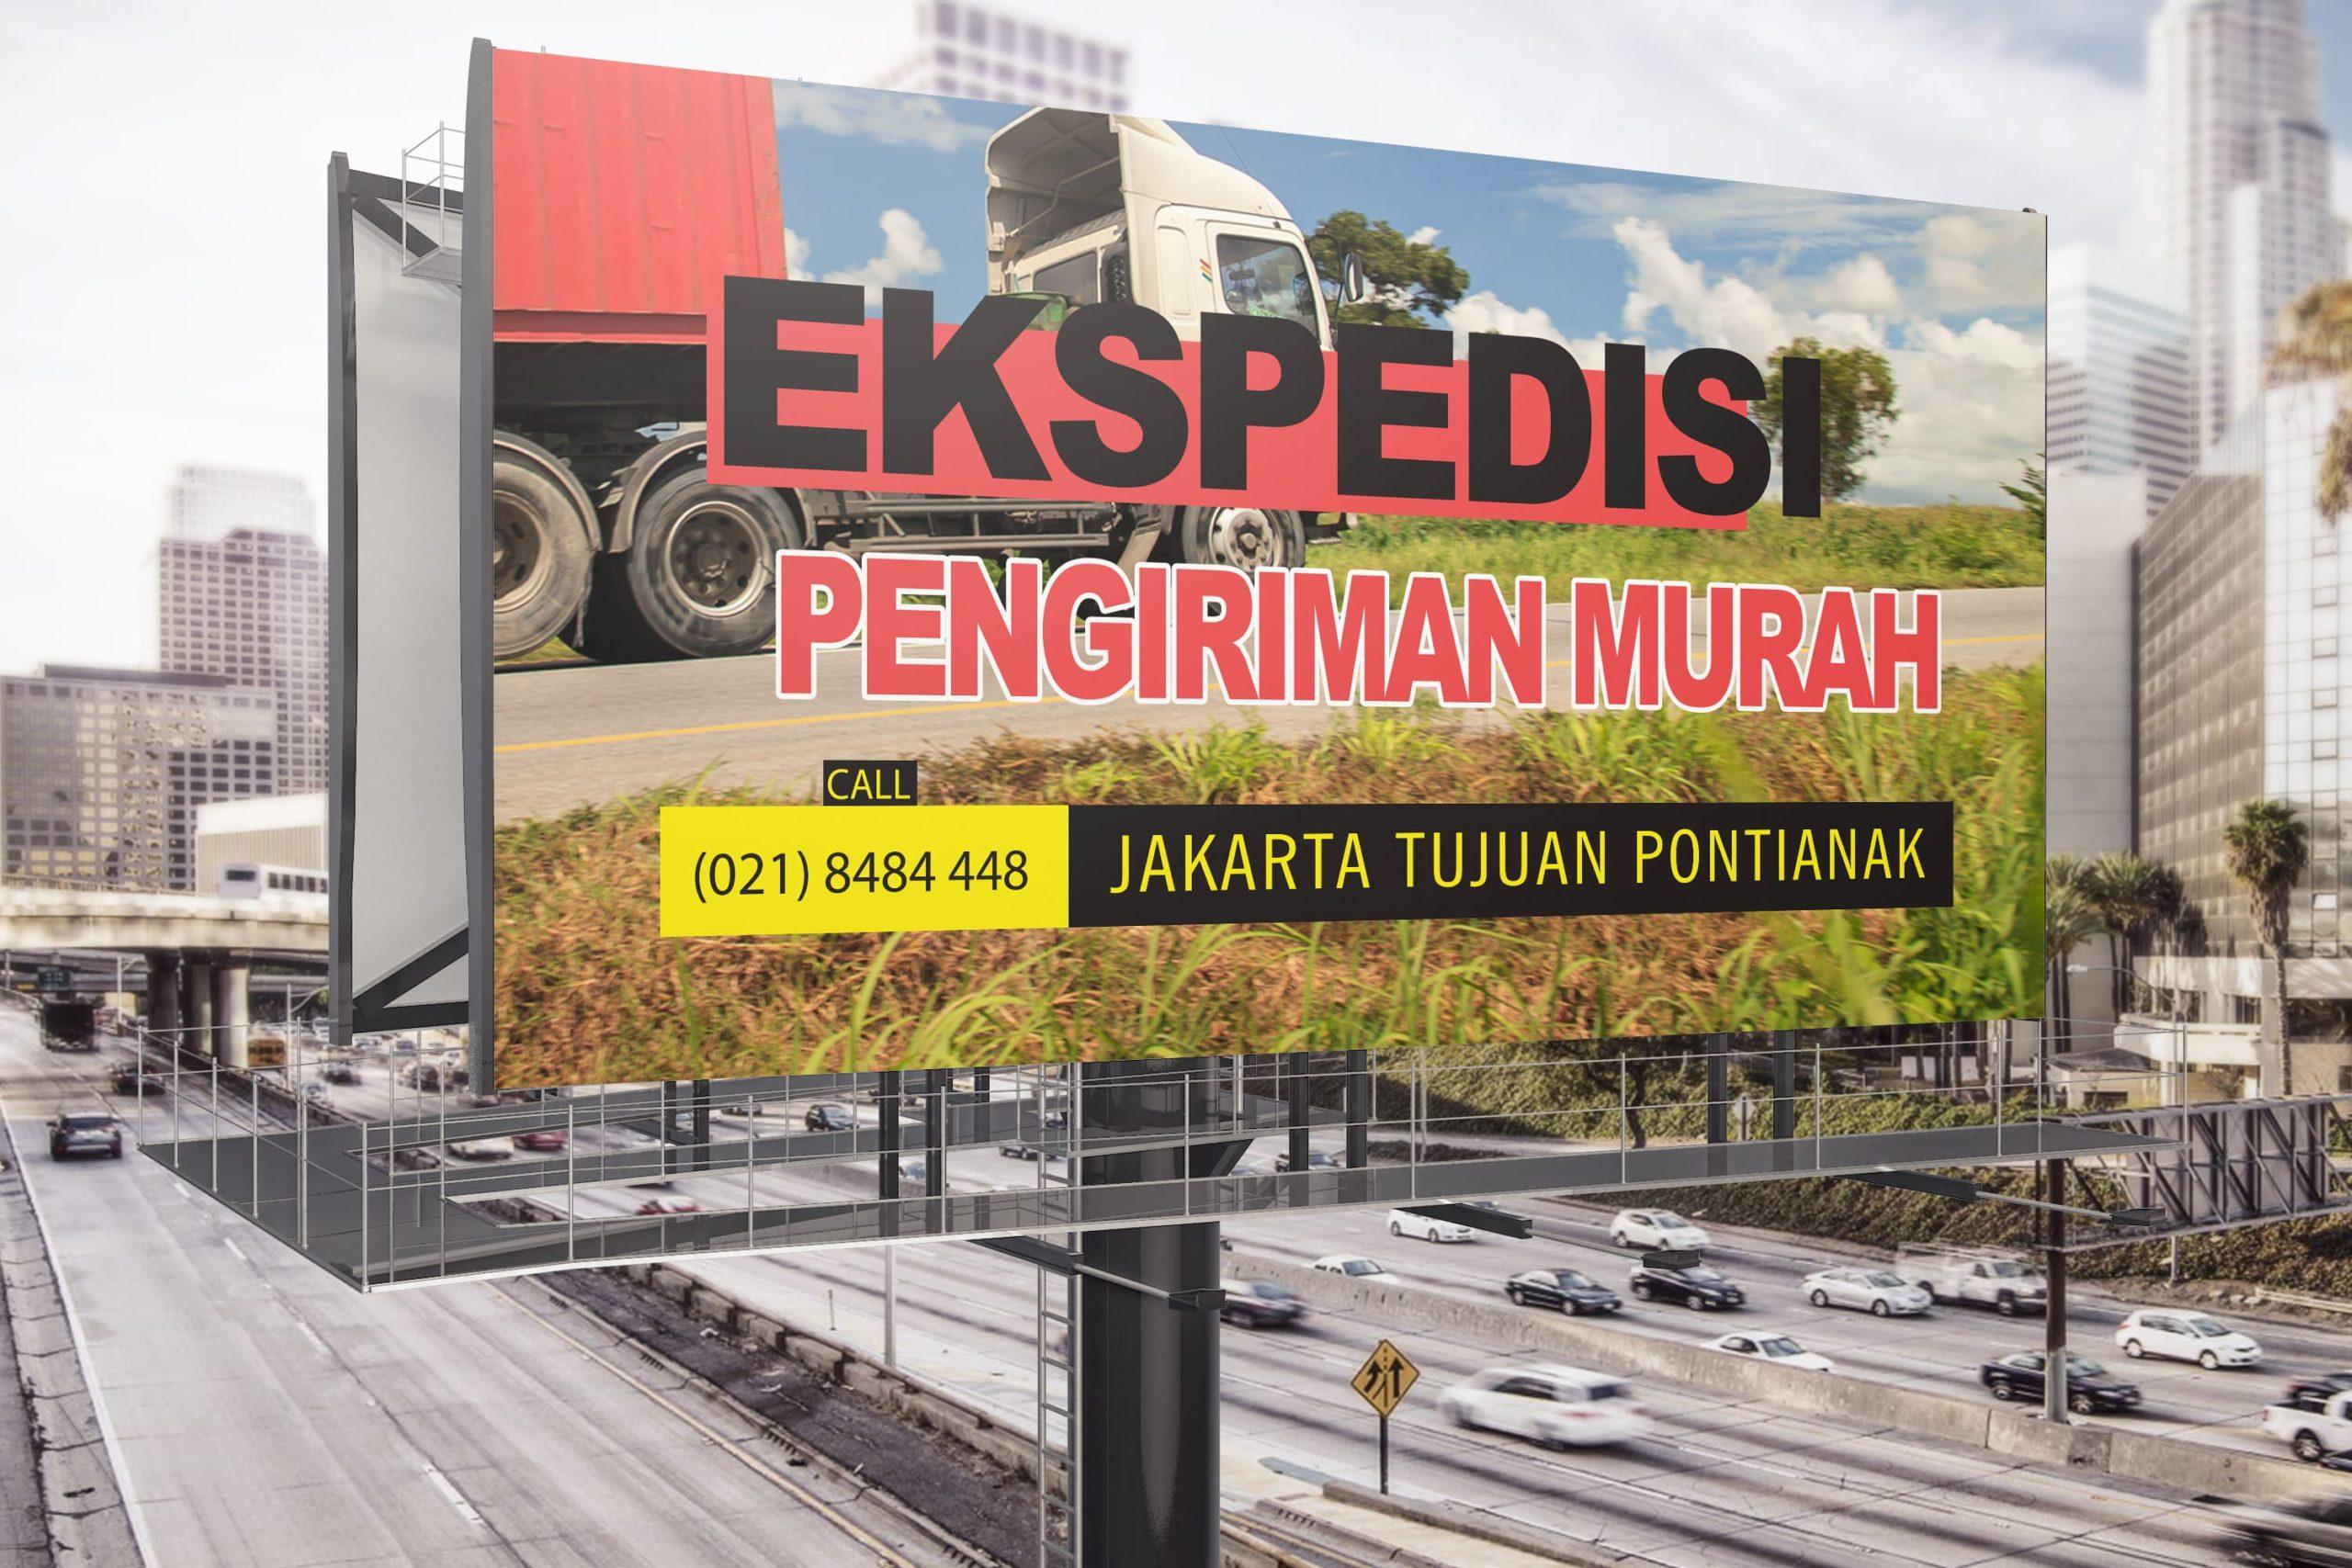 Jasa Pengiriman Barang Cargo Murah Jakarta ke Pontianak Kalimantan Barat